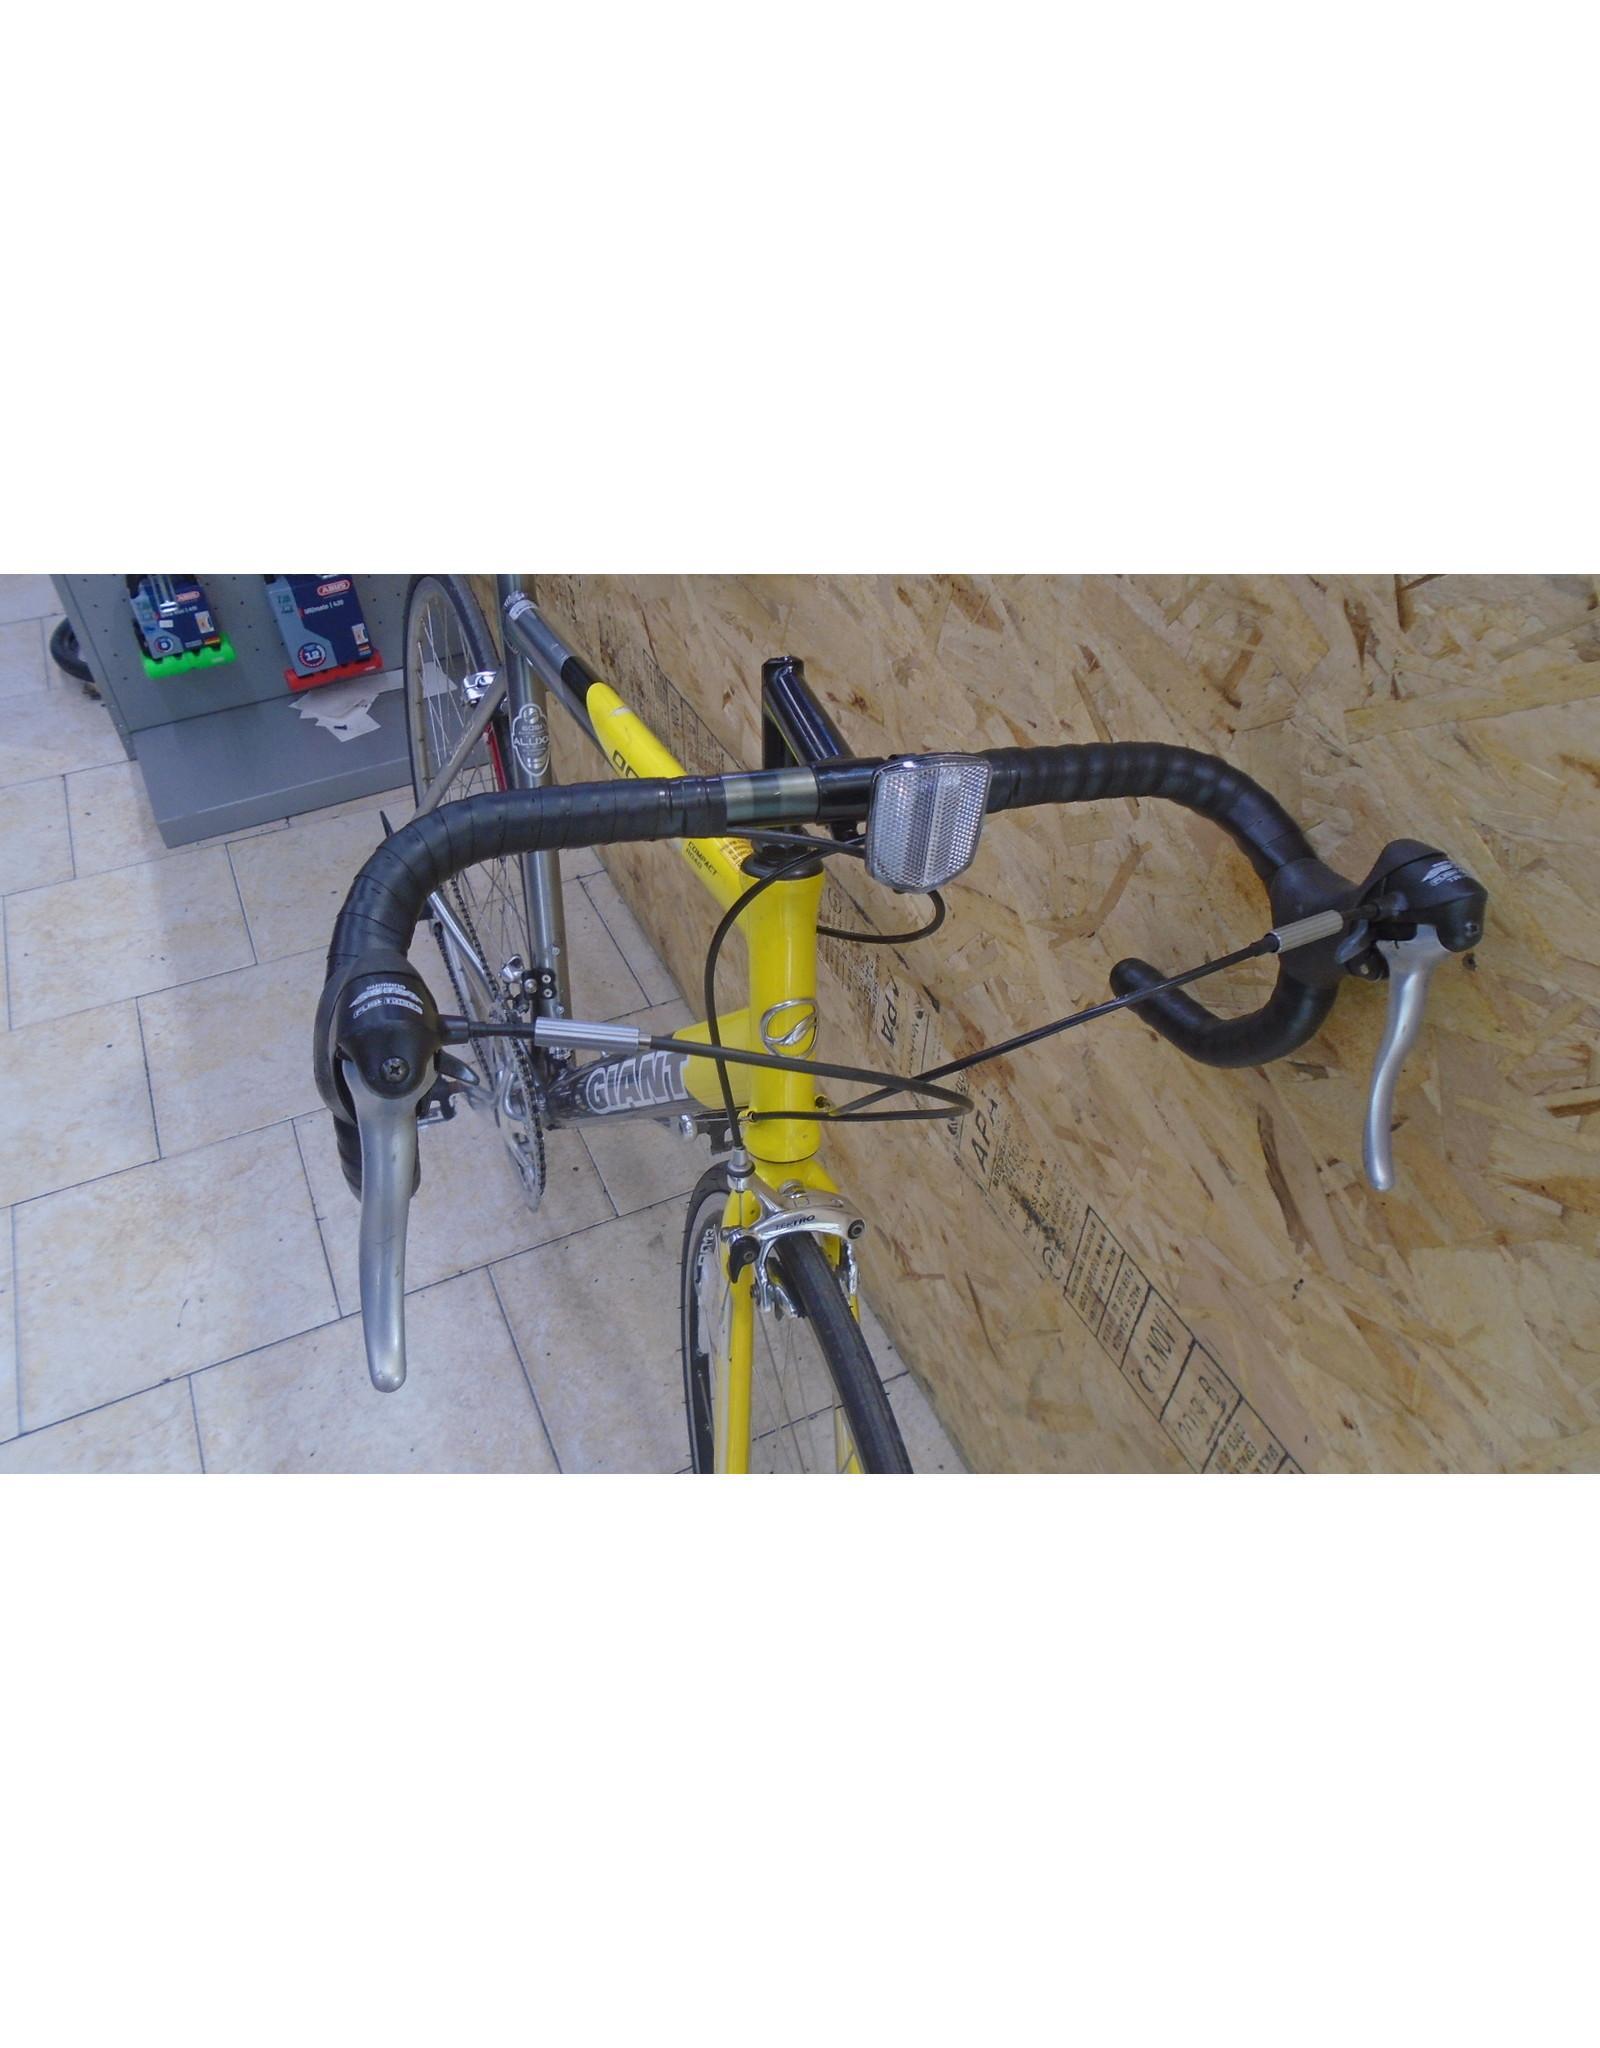 "Vélo usagé de route Giant OCR3 22"" - 10145"